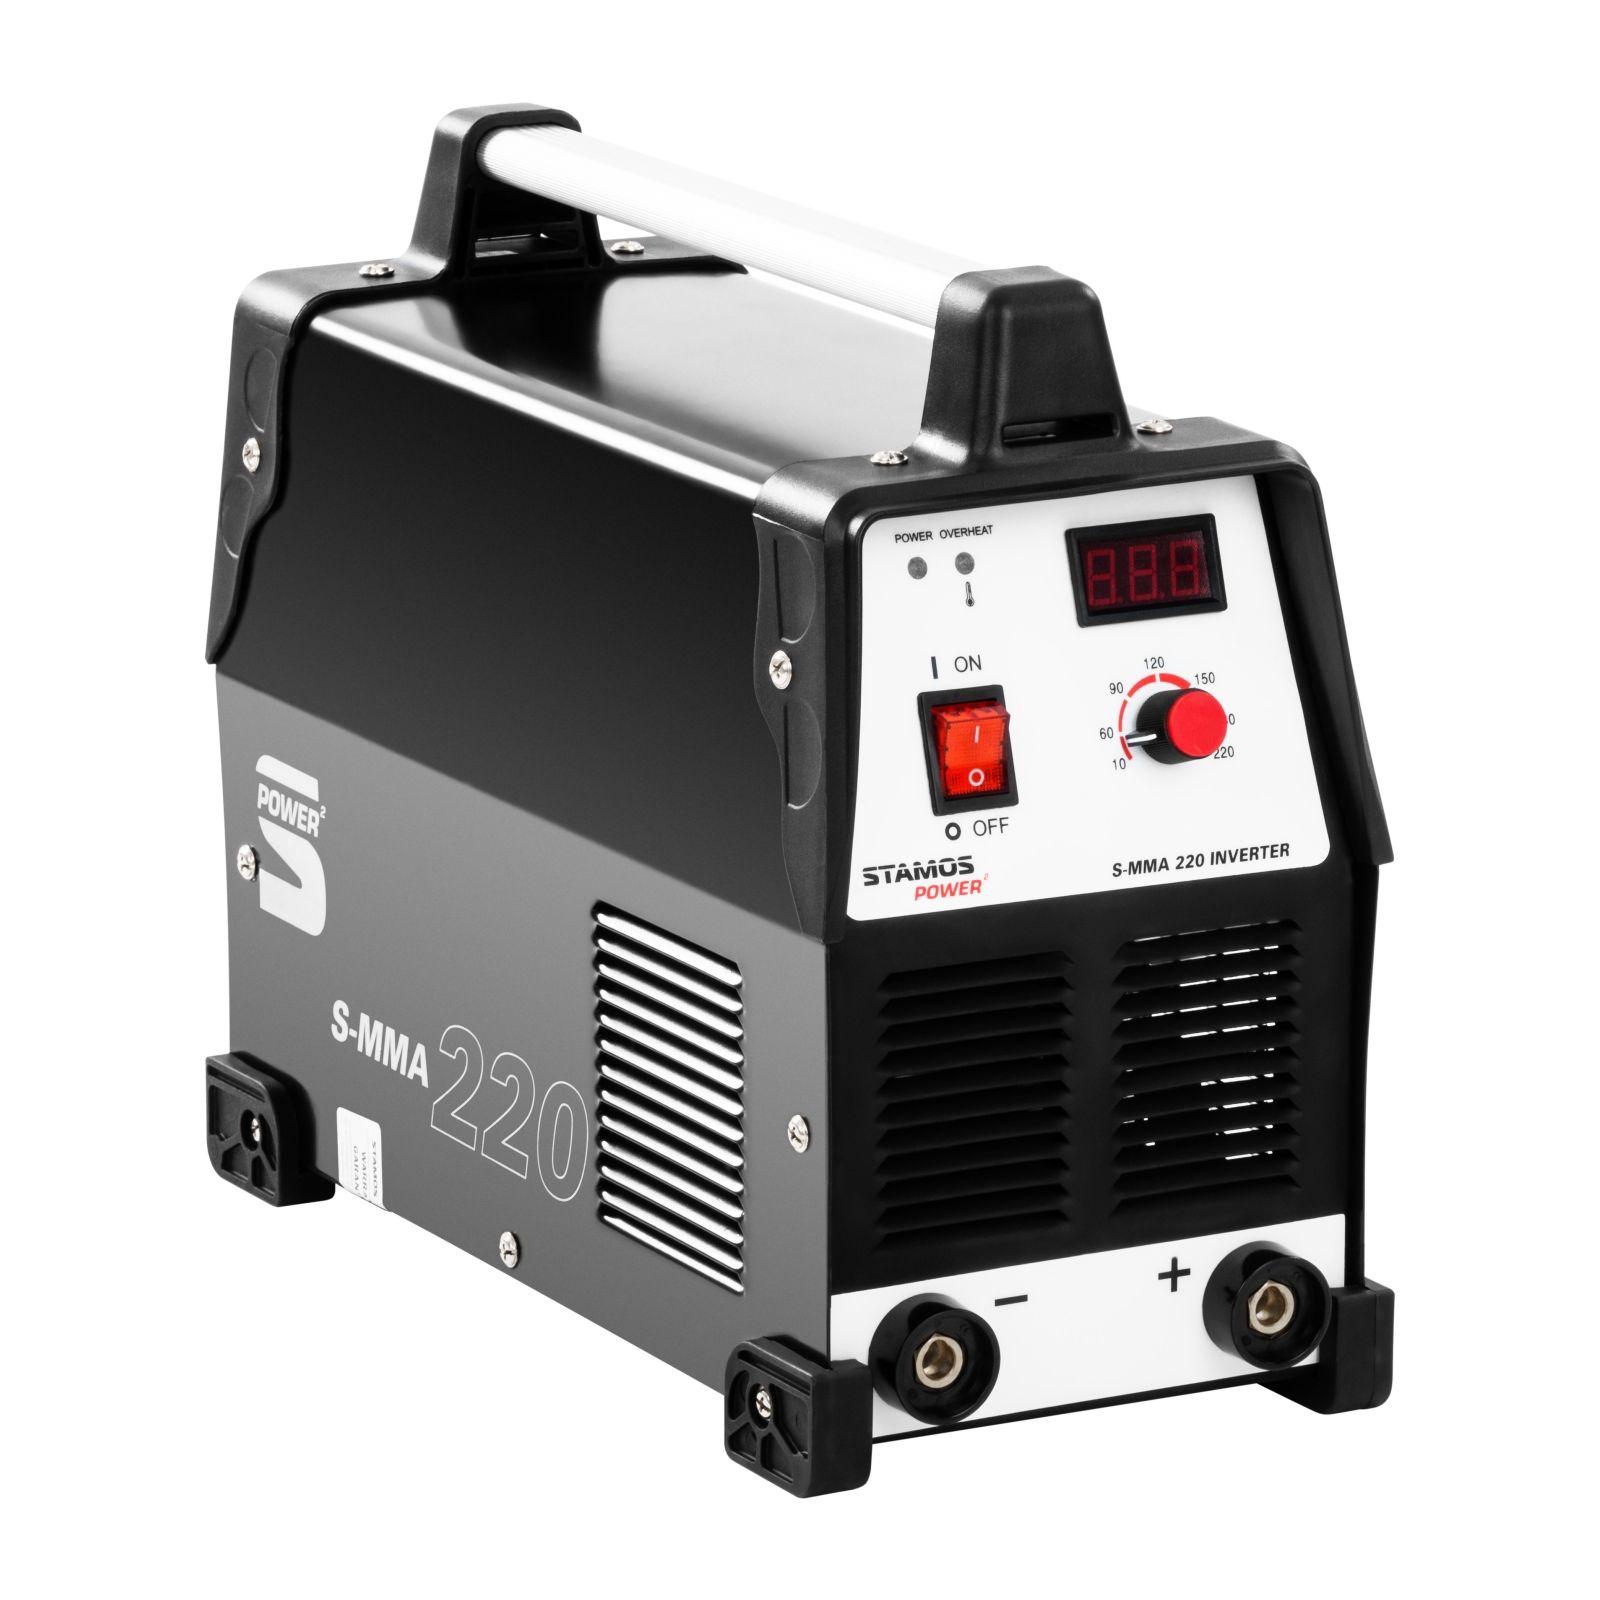 Stamos Power ² Elektroden Schweißgerät - 220 A - 230 V - LED 10020130